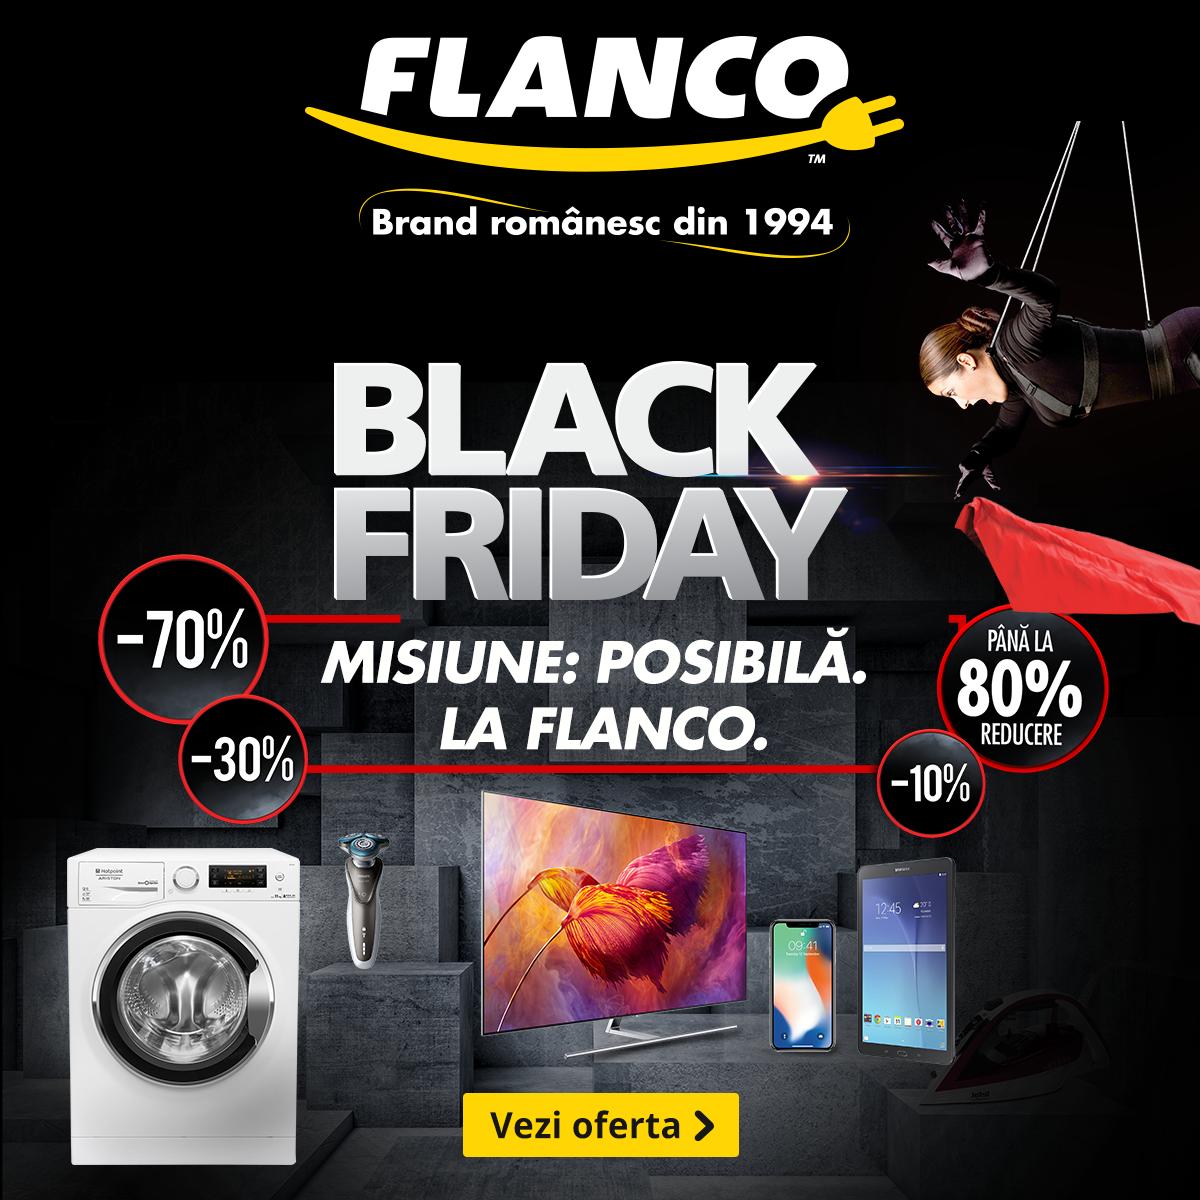 Black Friday începe mâine la Flanco